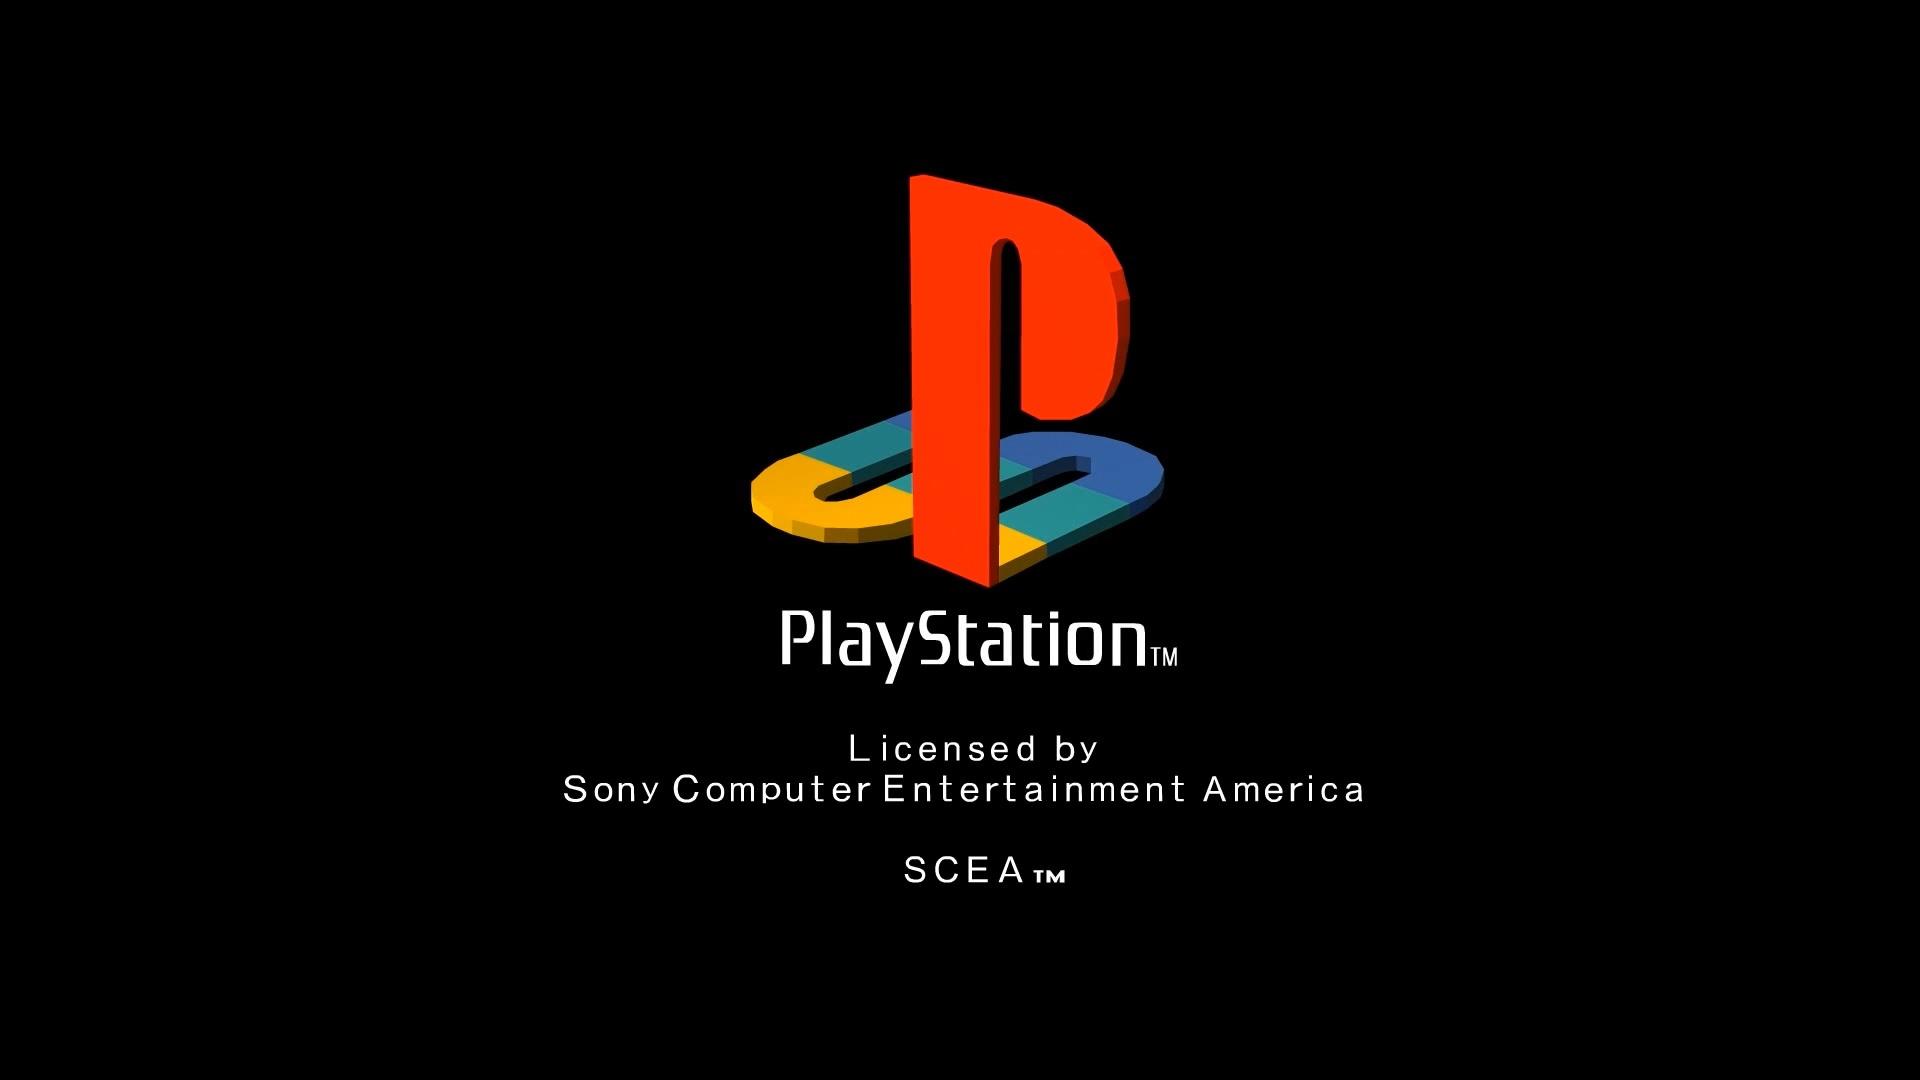 sony playstation 2 logo. psx intro (rockstar logo replace) sony playstation 2